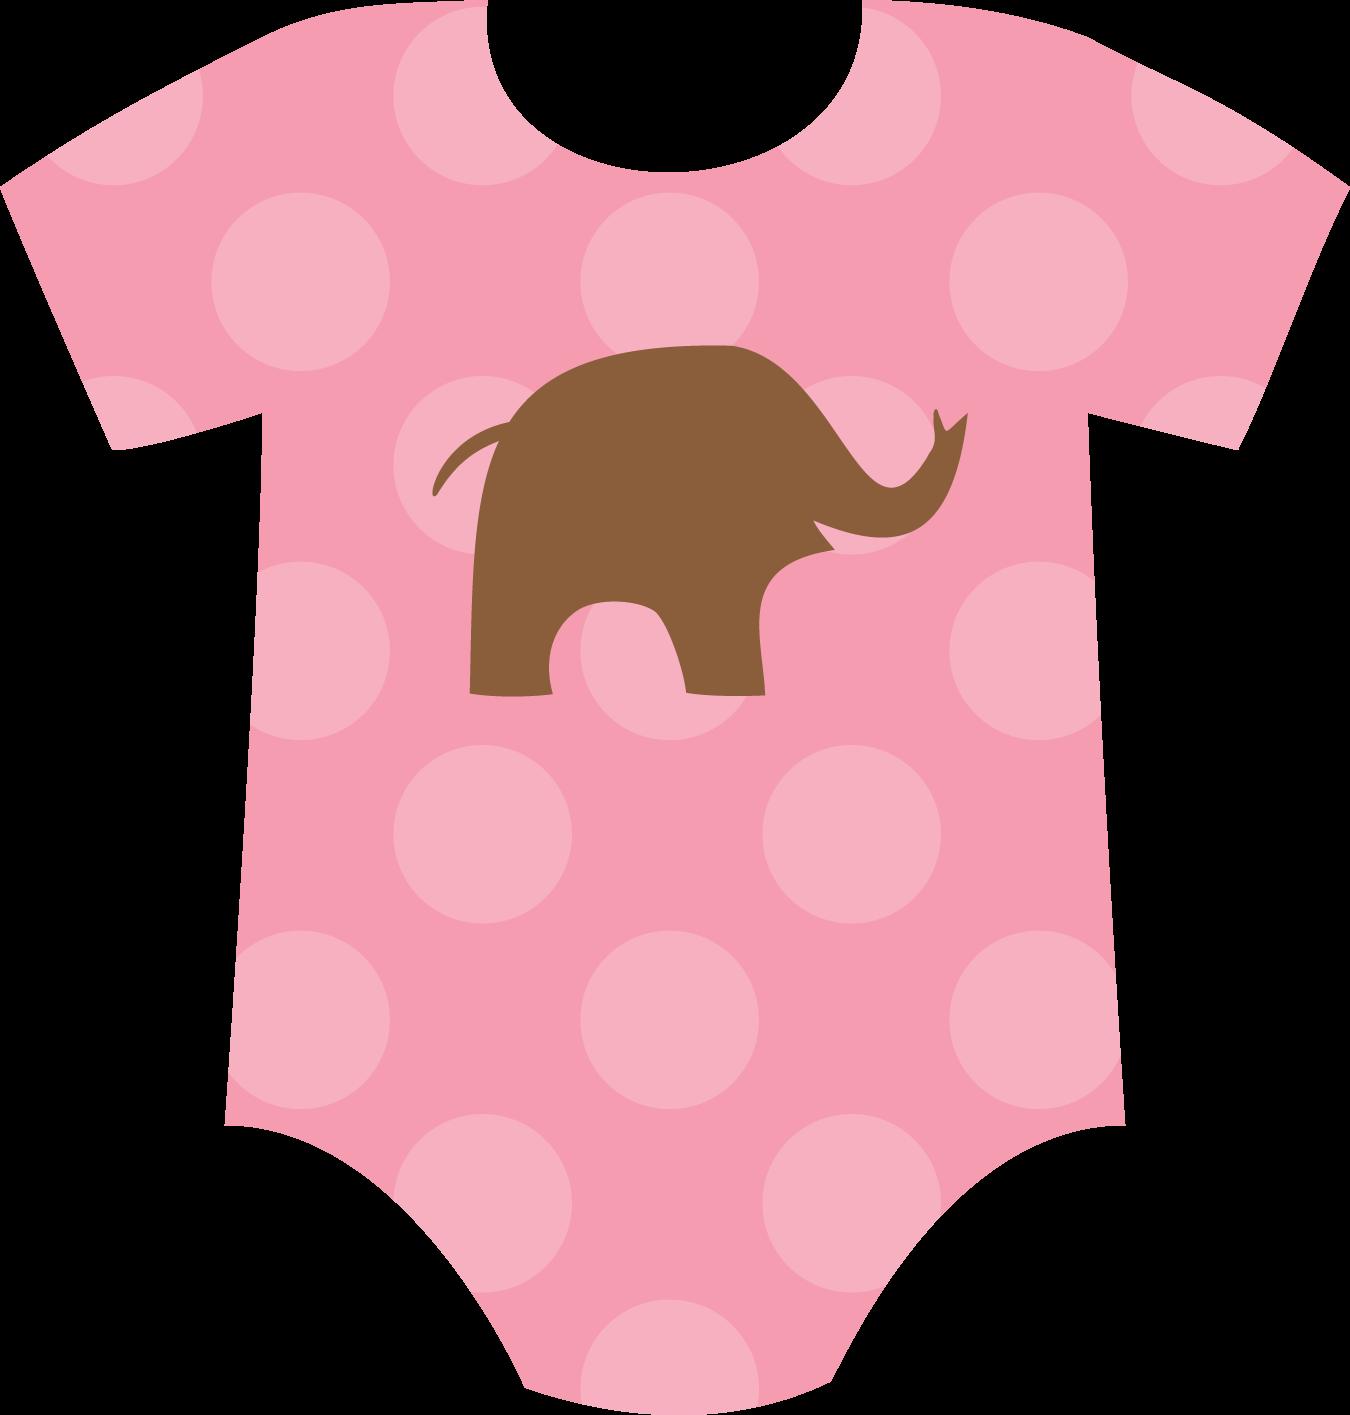 Baby onesies oh my. Navy clipart onesie